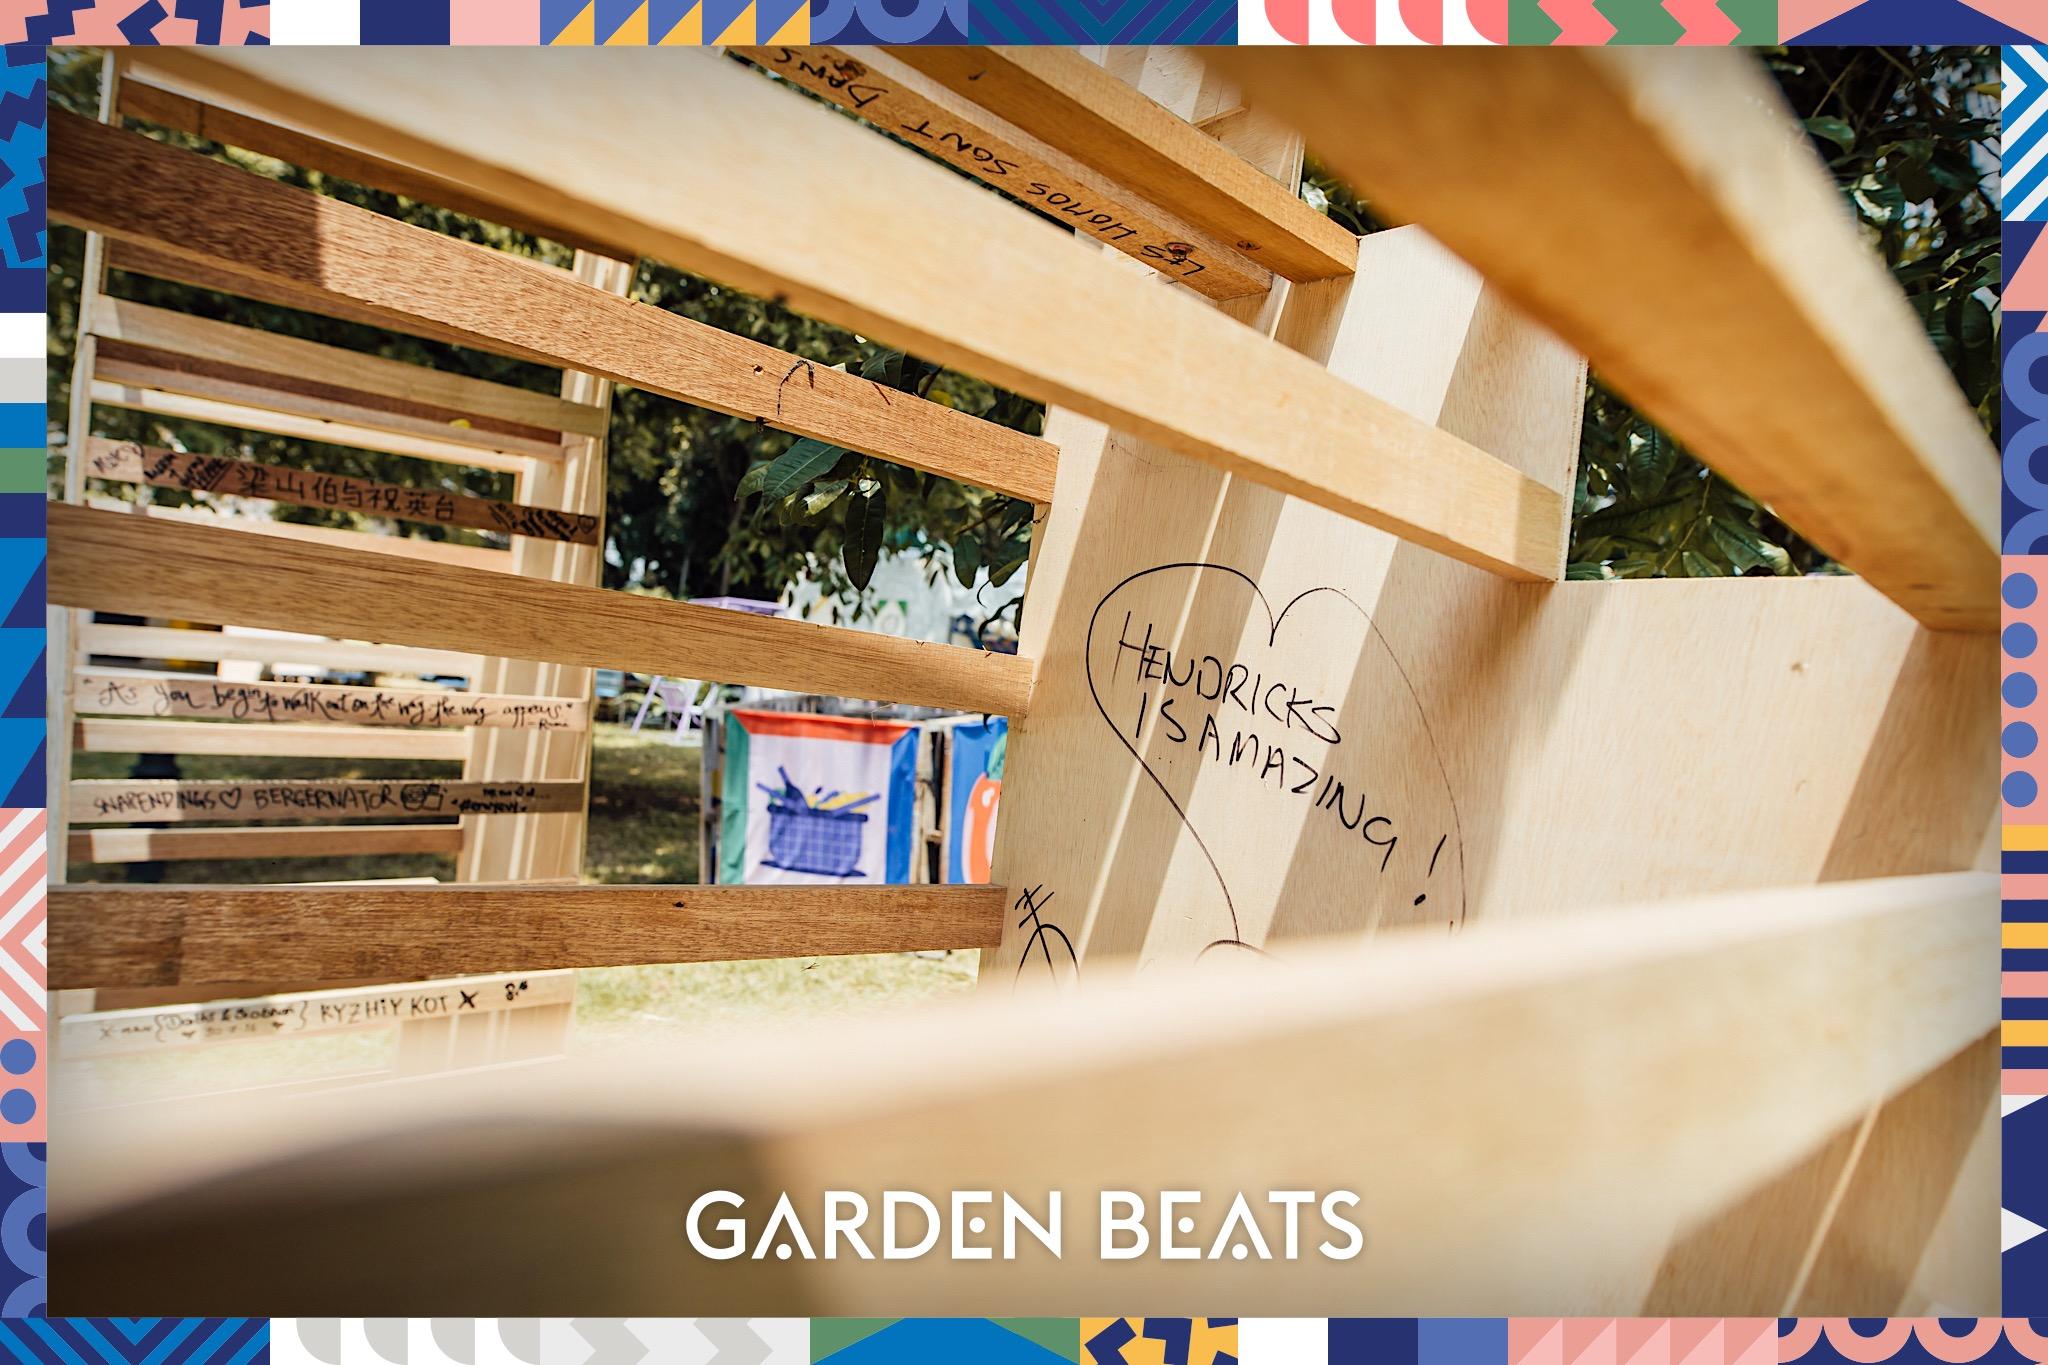 18032017_GardenBeats_Colossal030_WatermarkedGB.jpg